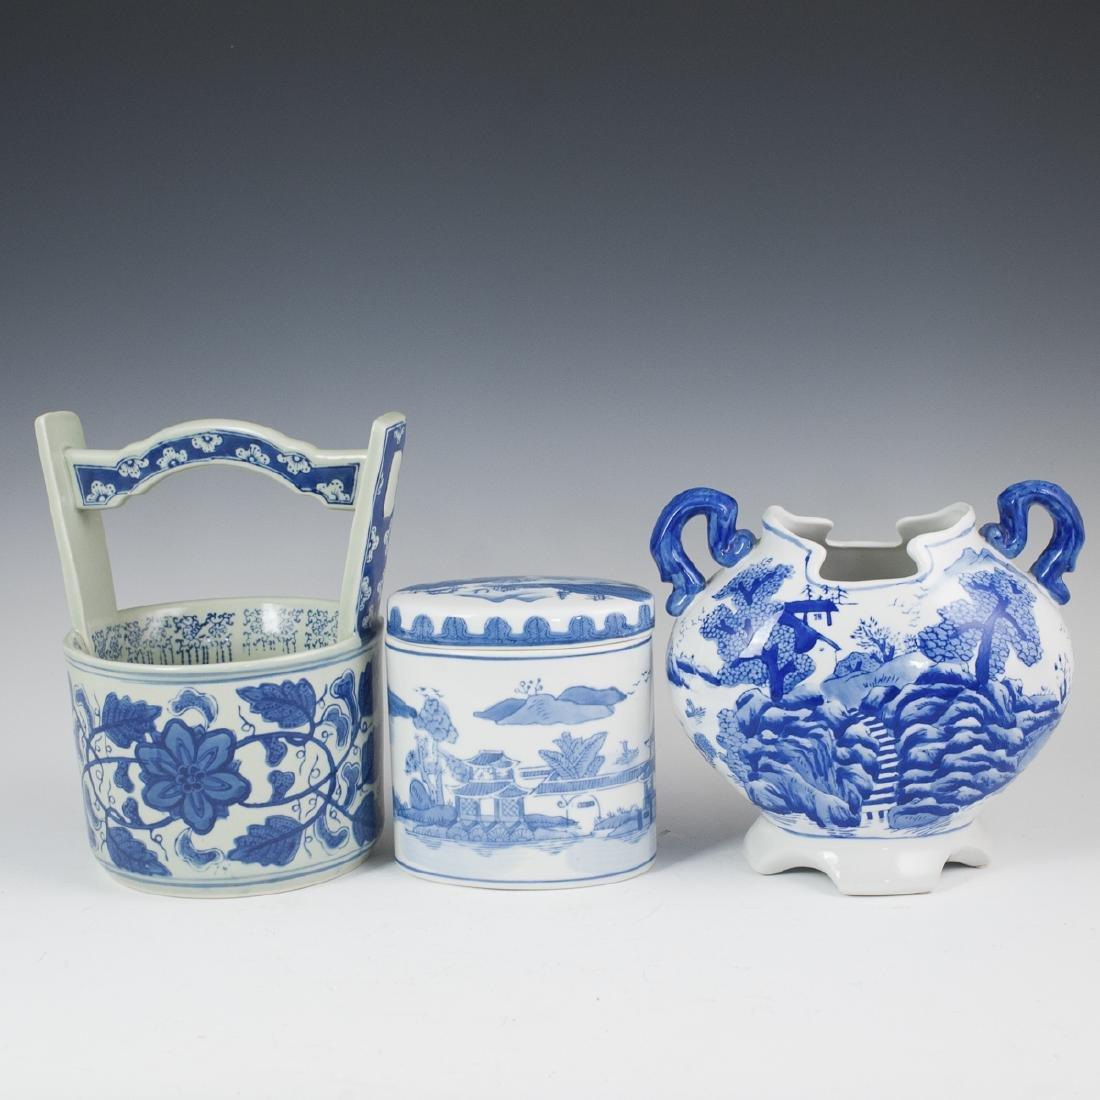 Decorative Chinese Blue & White Porcelain